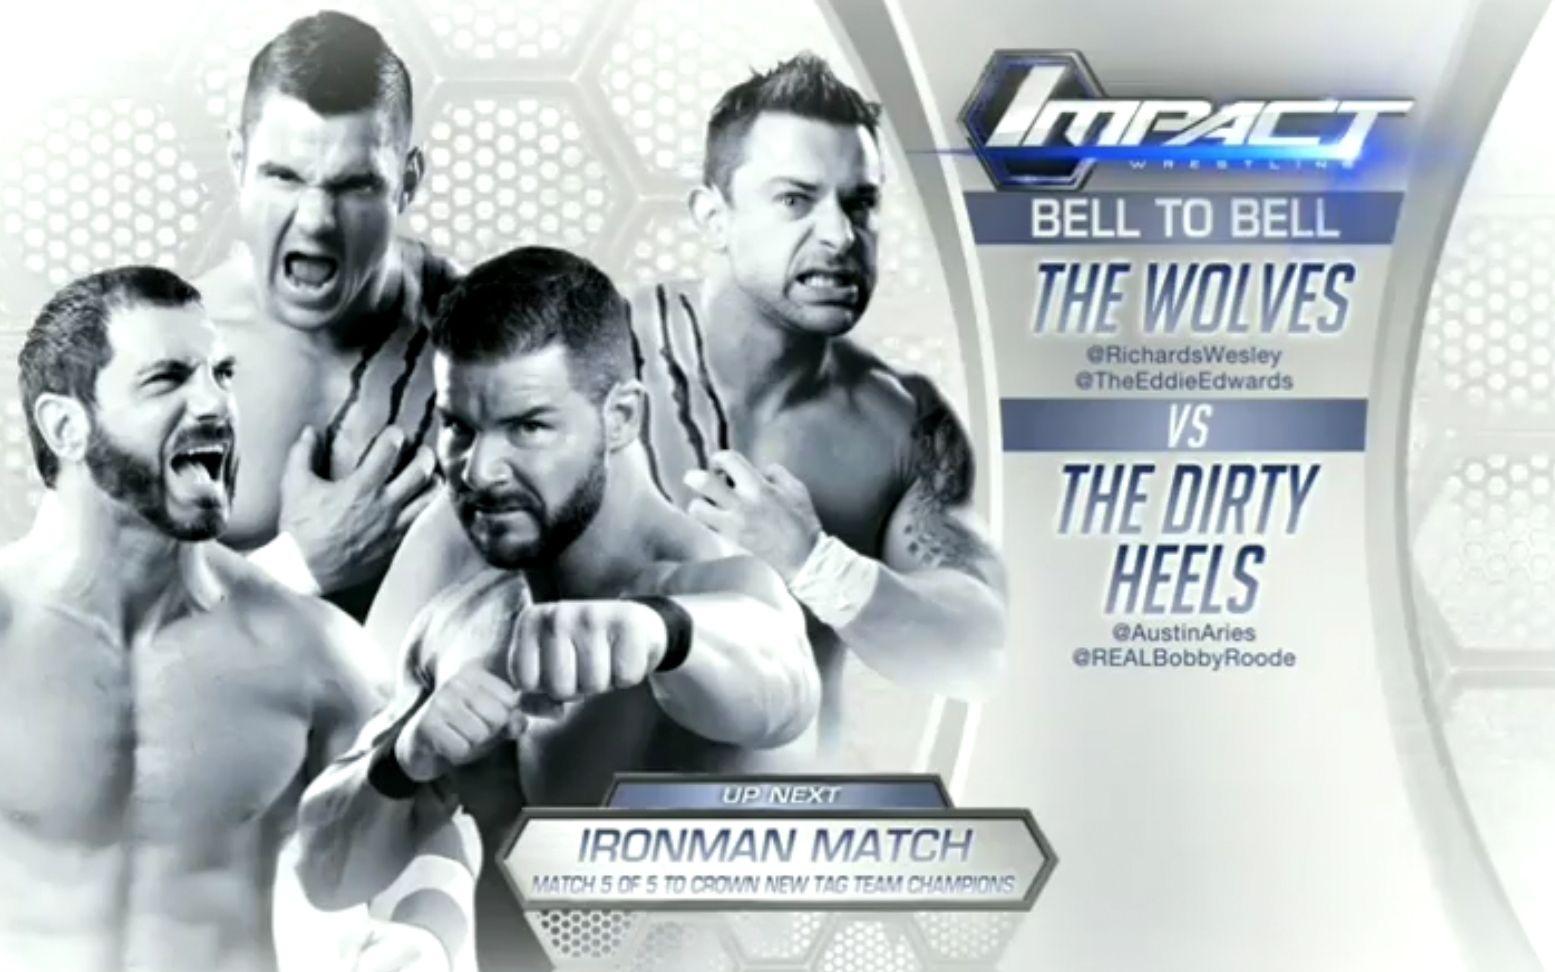 【7.96分】Bobby Roode u0026 Austin Aries vs. Davey Richards u0026 Eddie Edwards TNA 2015